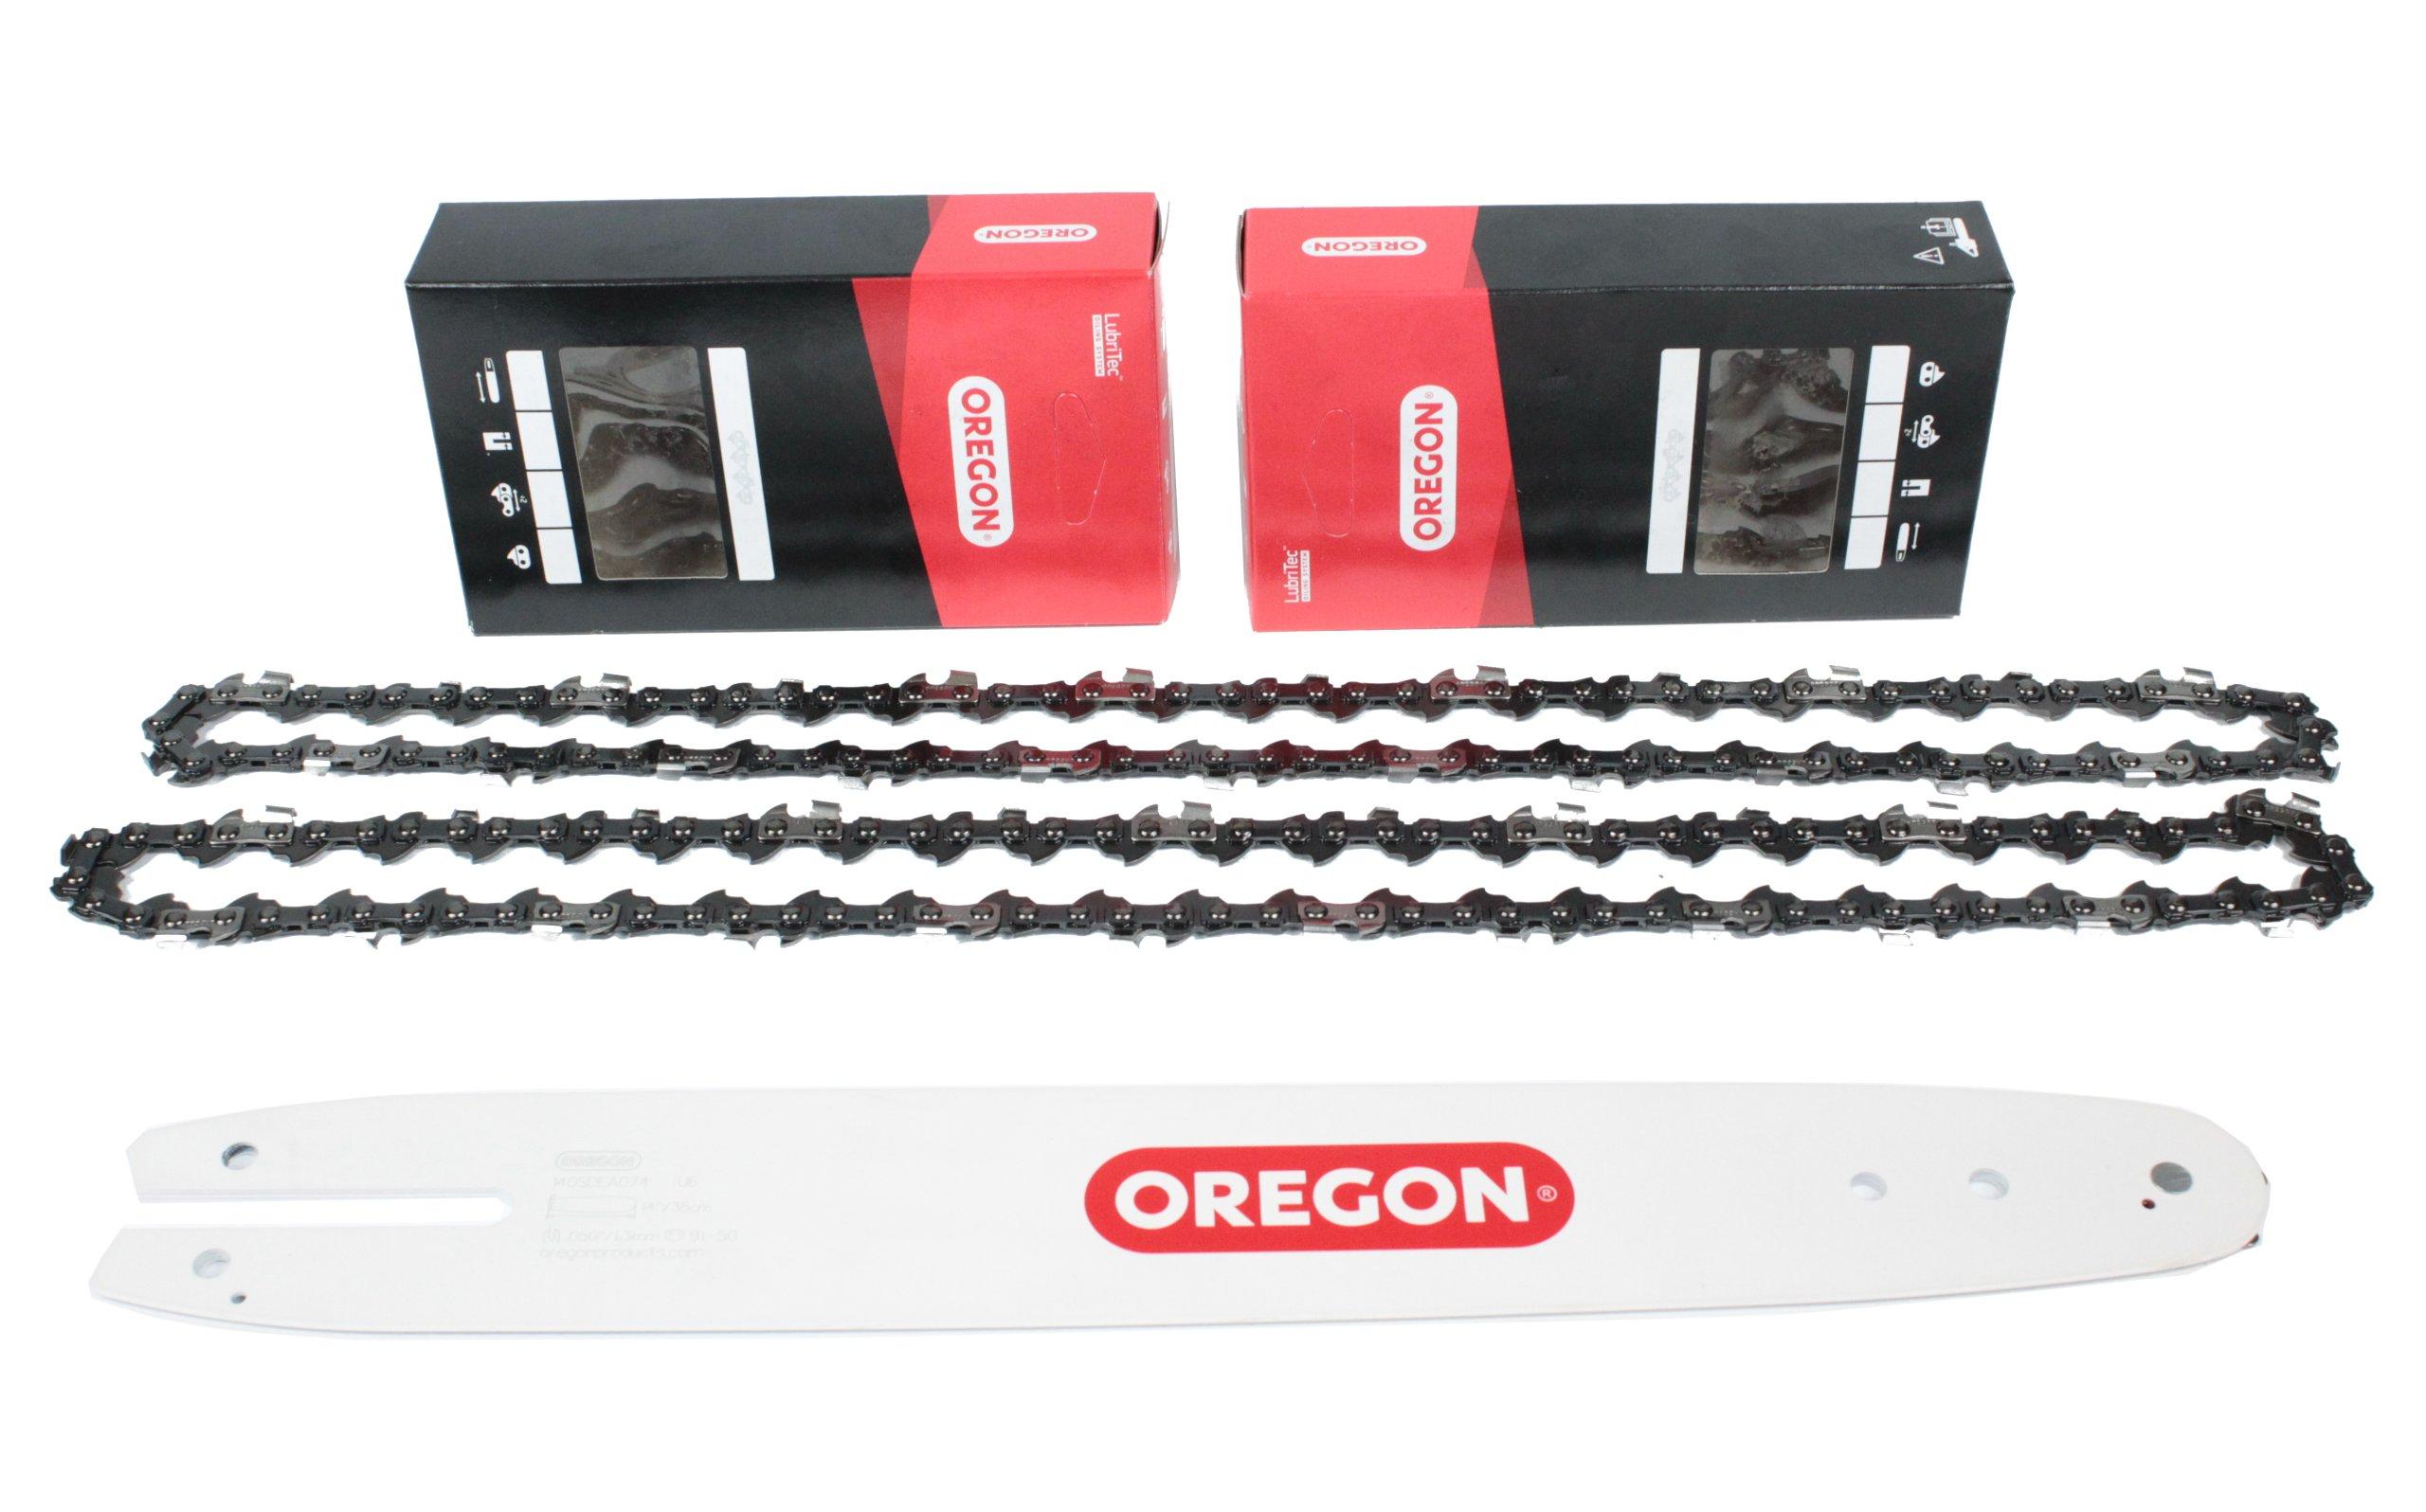 Бензопилы «oregon» — инструмент, в котором качество взято за правило